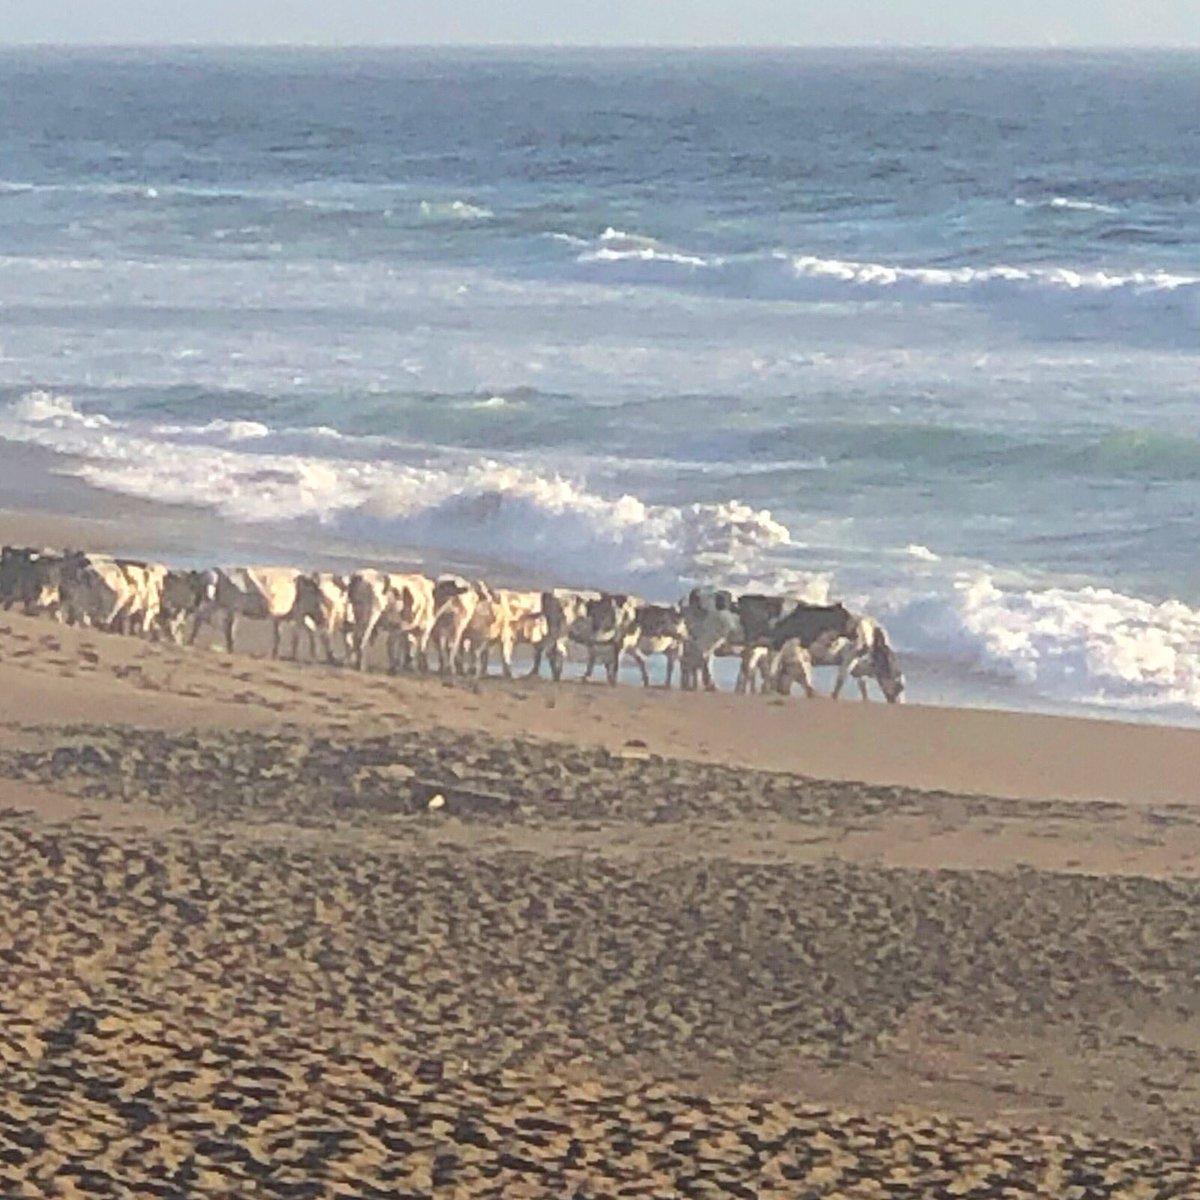 The rare Point Reyes beach cows. (Thx SC) <br>http://pic.twitter.com/K8Q90gnFfg